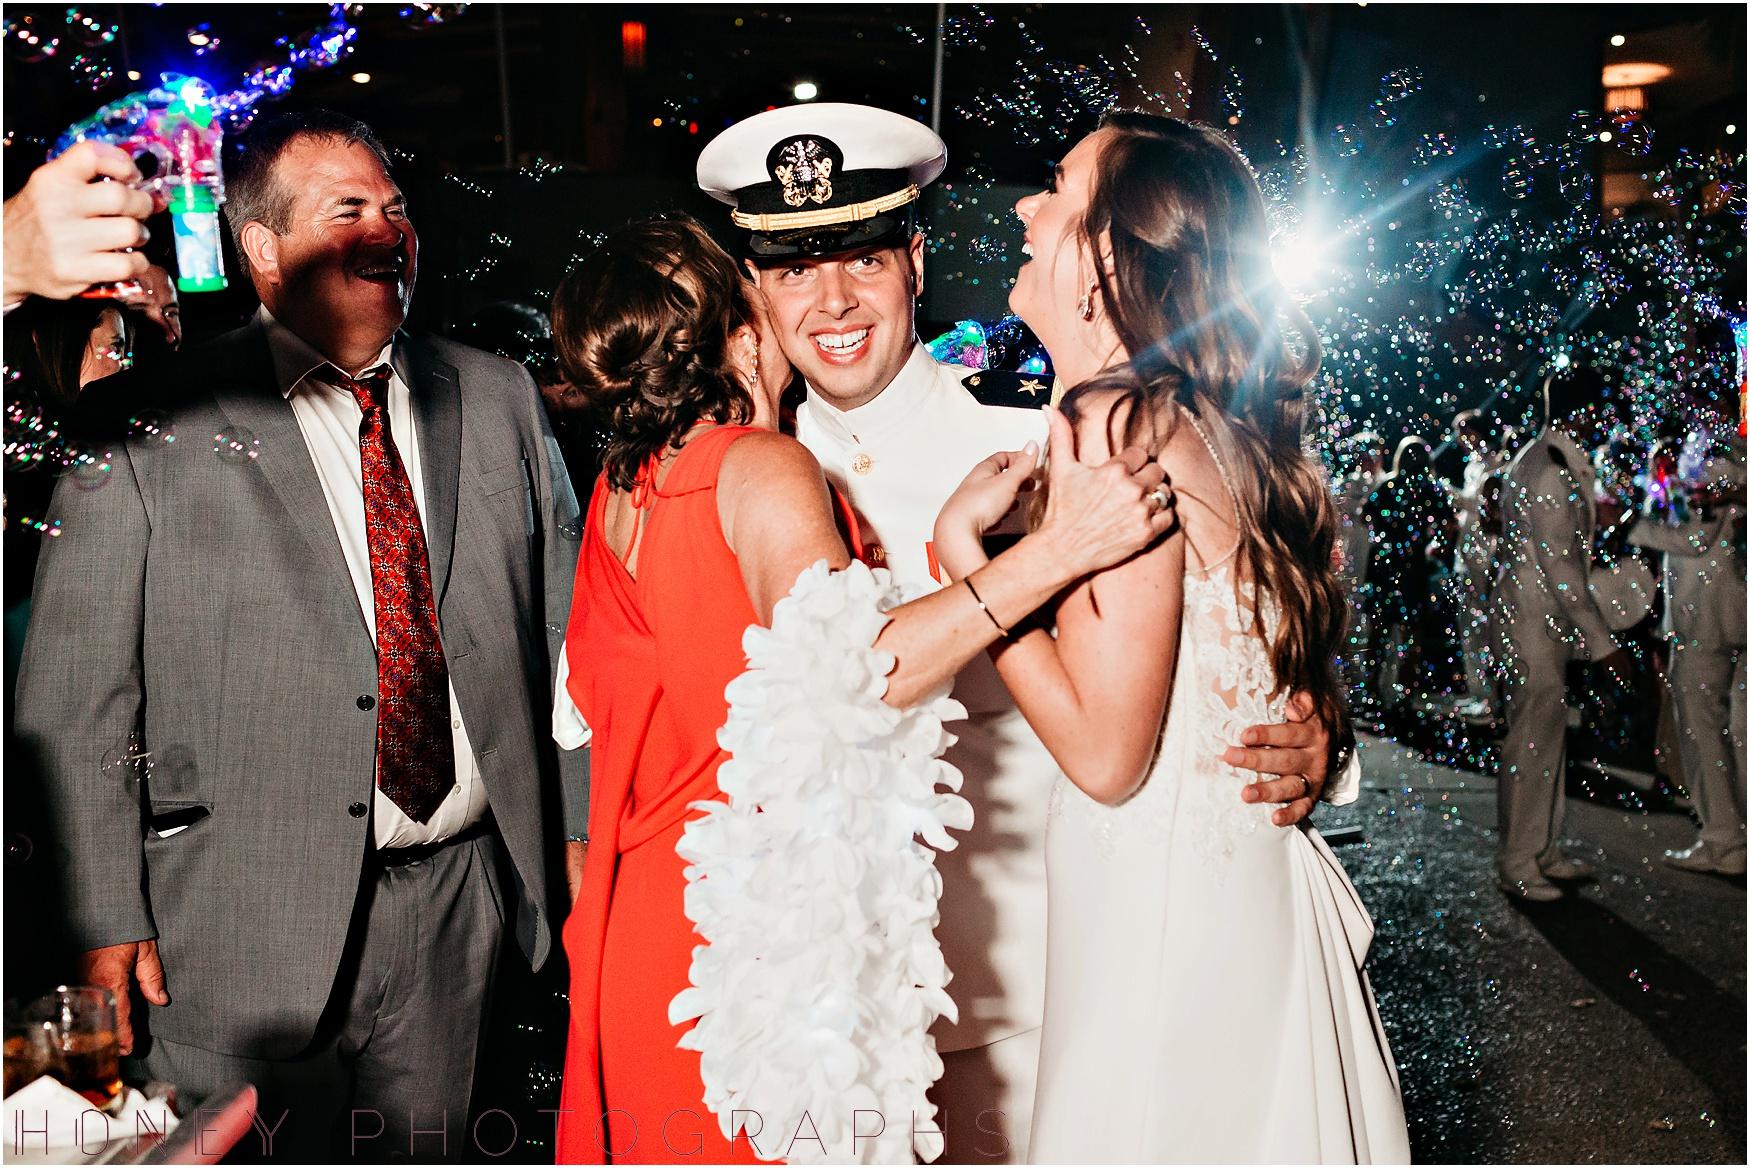 bali-hai-tropical-bubble-exit-party-paradise-wedding076.jpg